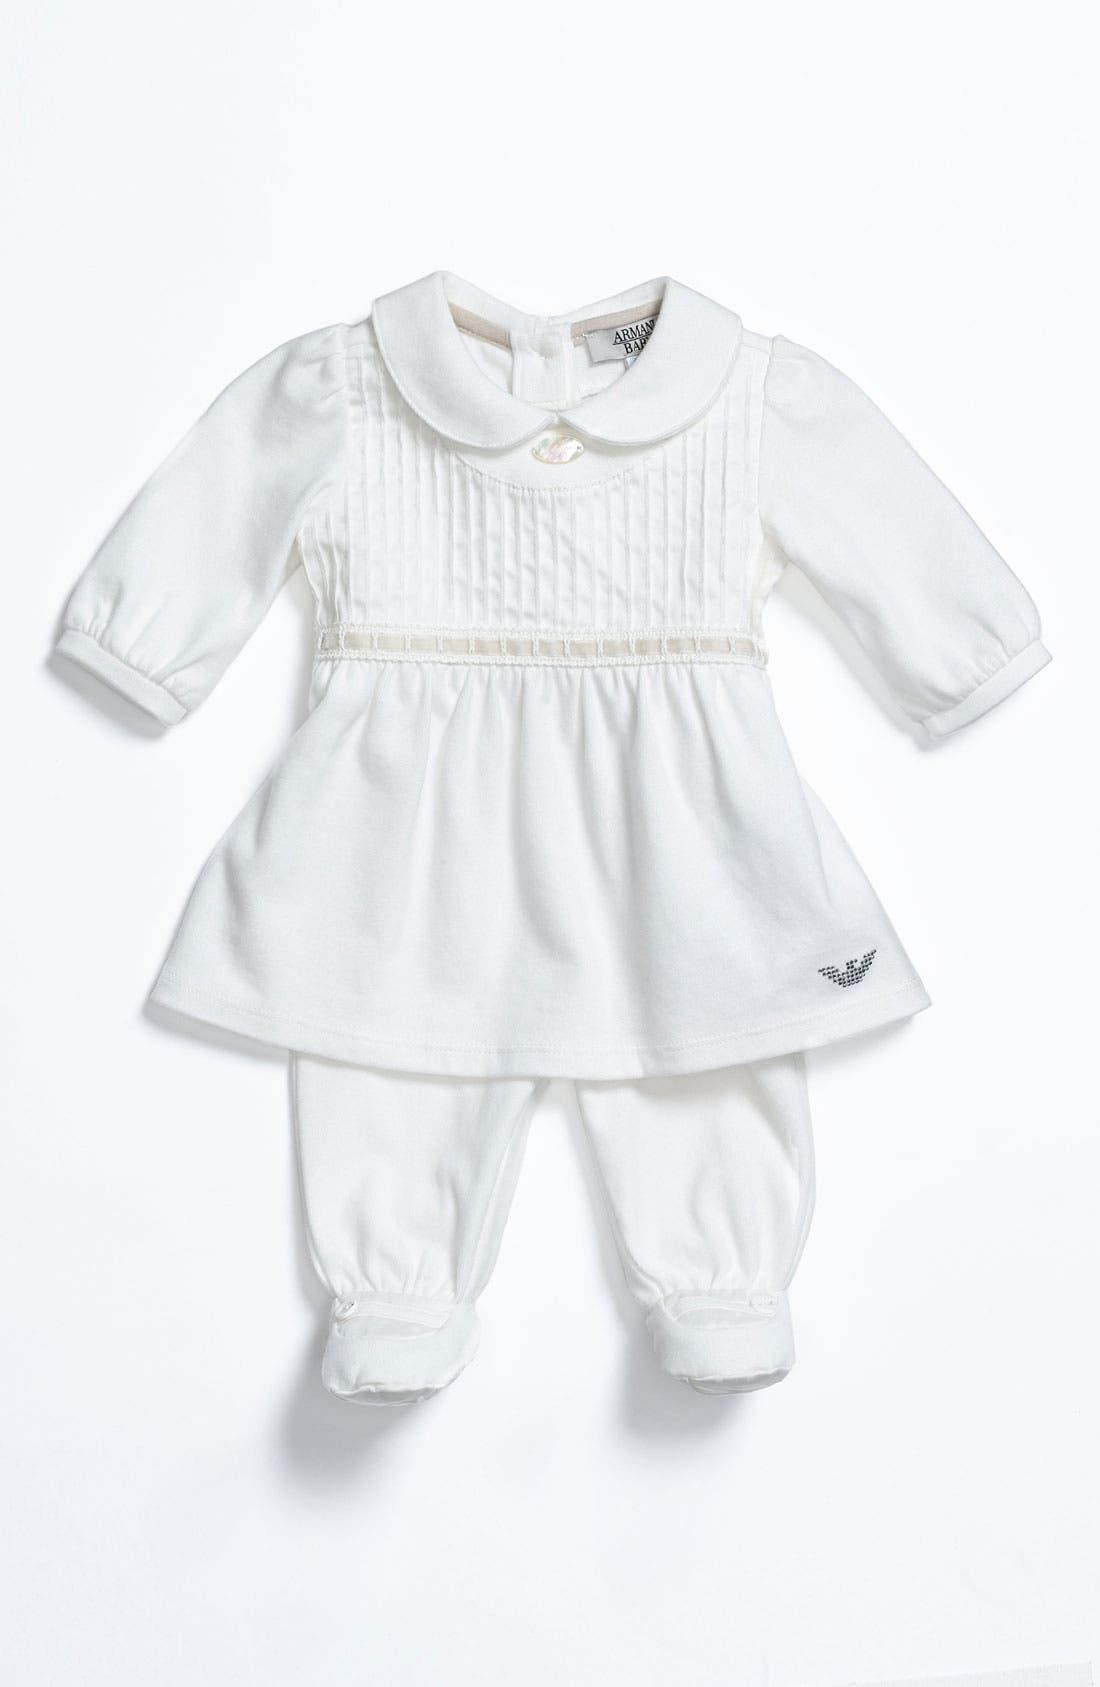 Main Image - Armani Junior Dress & Footed Leggings (Infant)